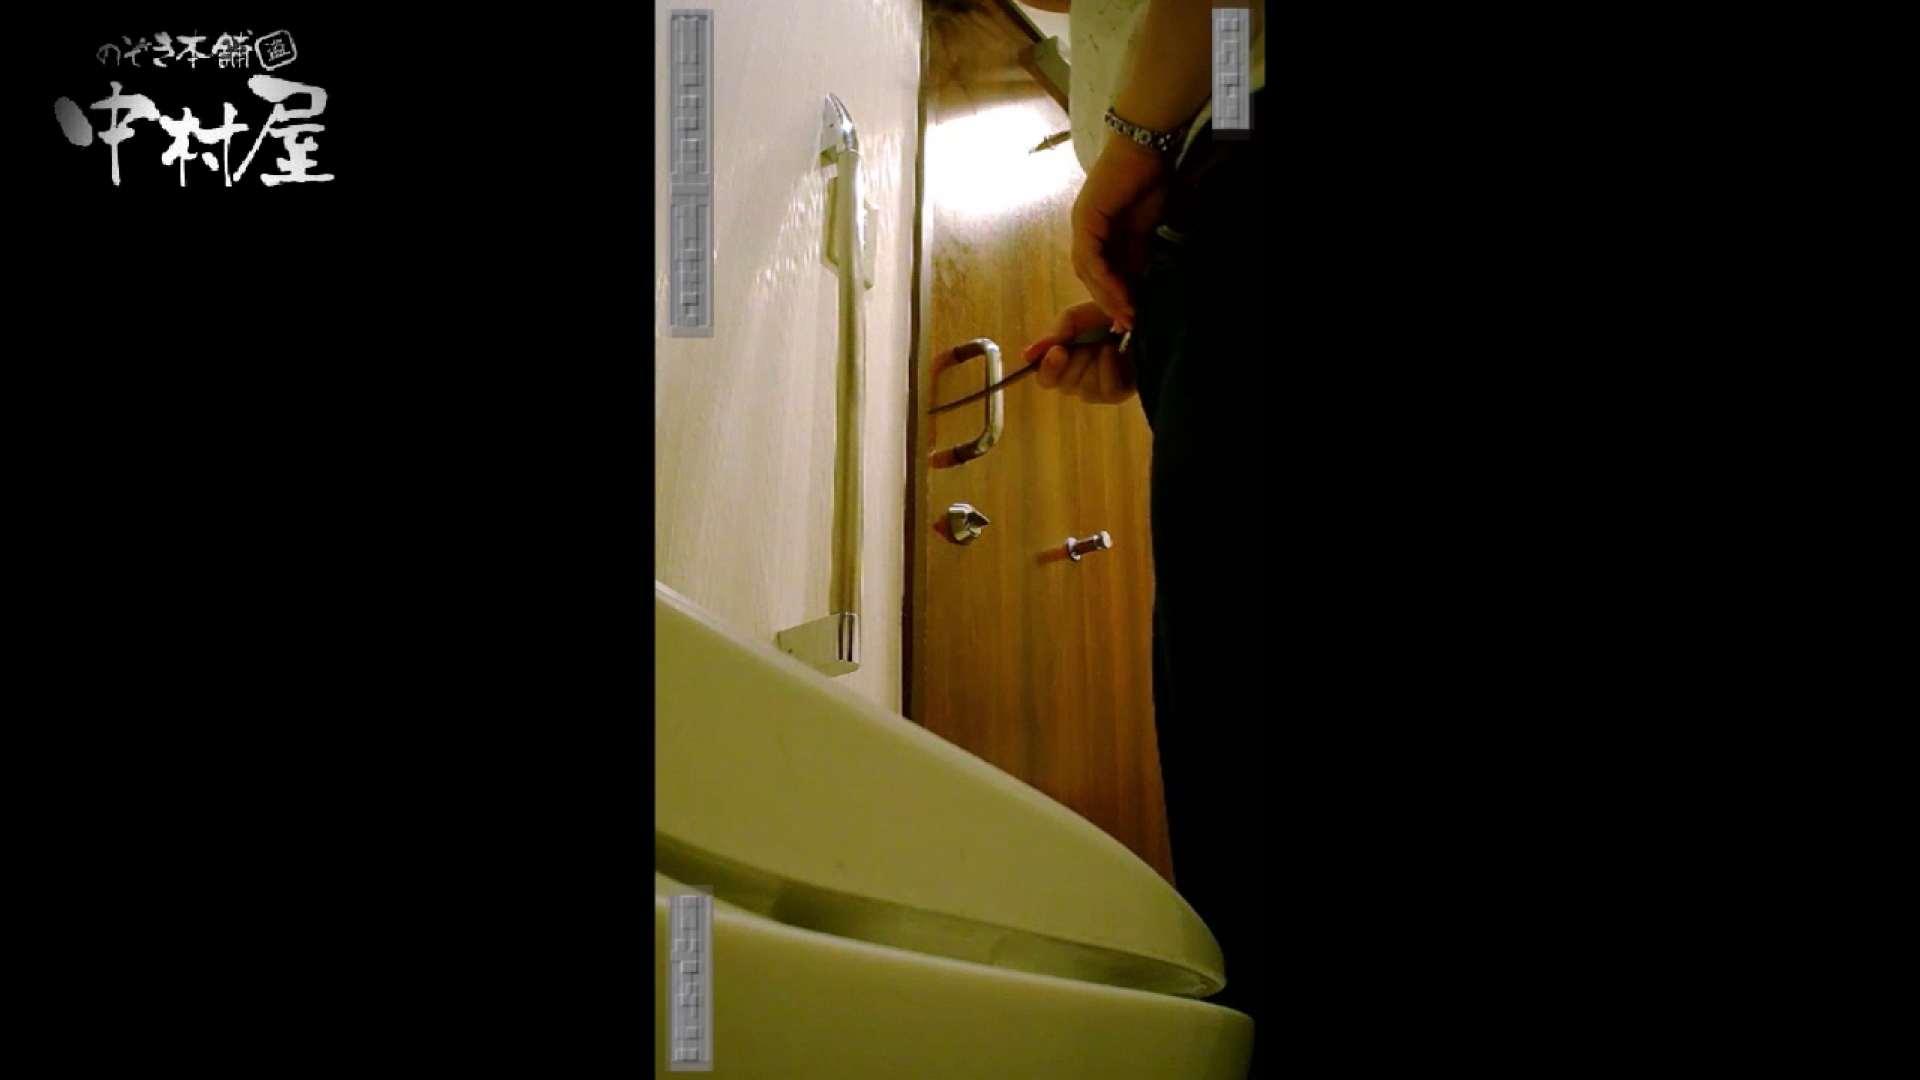 高画質トイレ盗撮vol.15 盗撮 SEX無修正画像 111画像 22